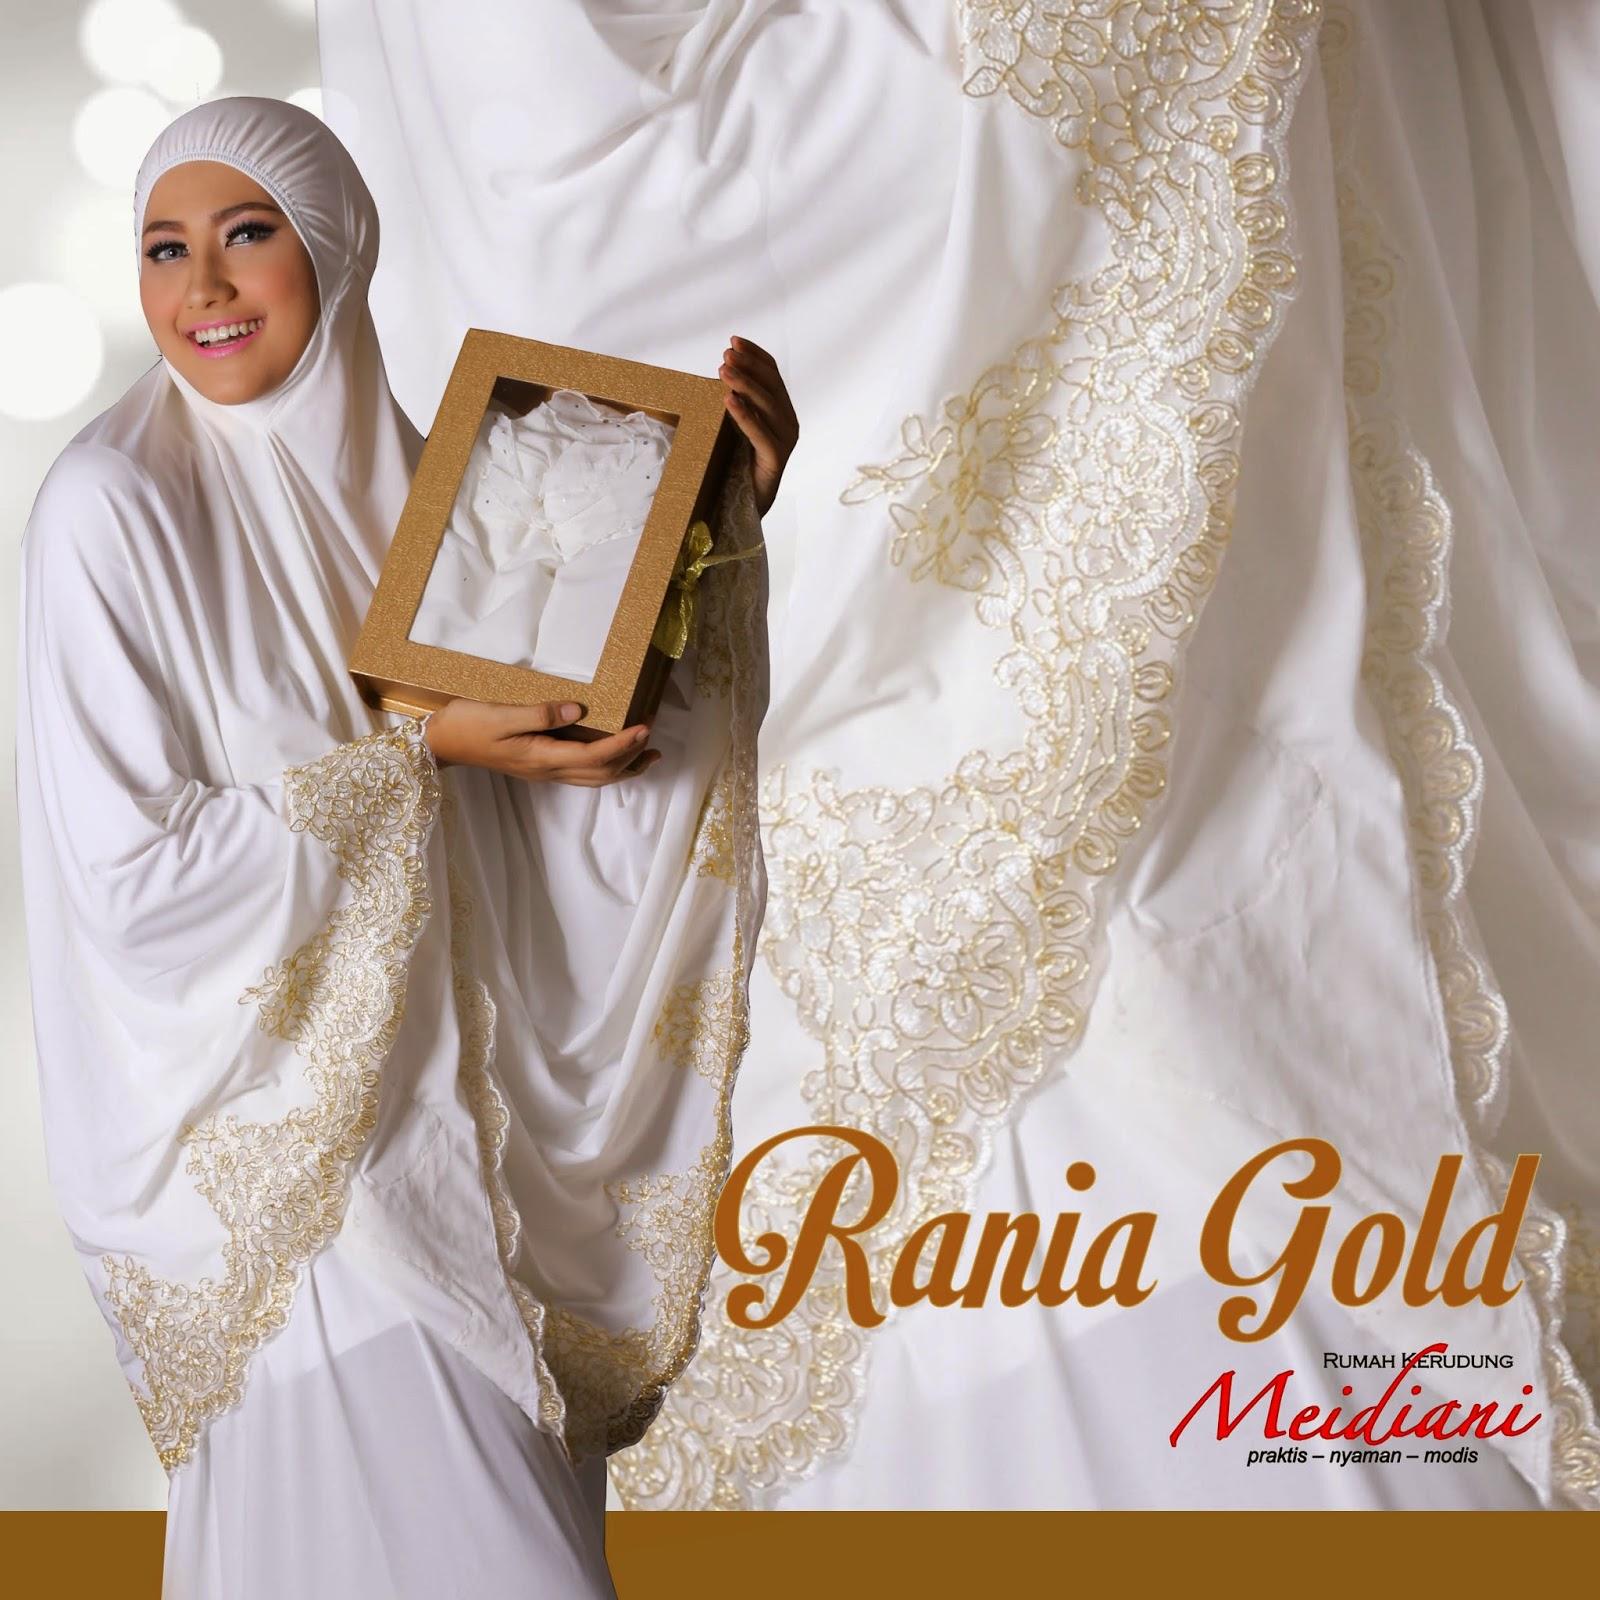 Rania Gold